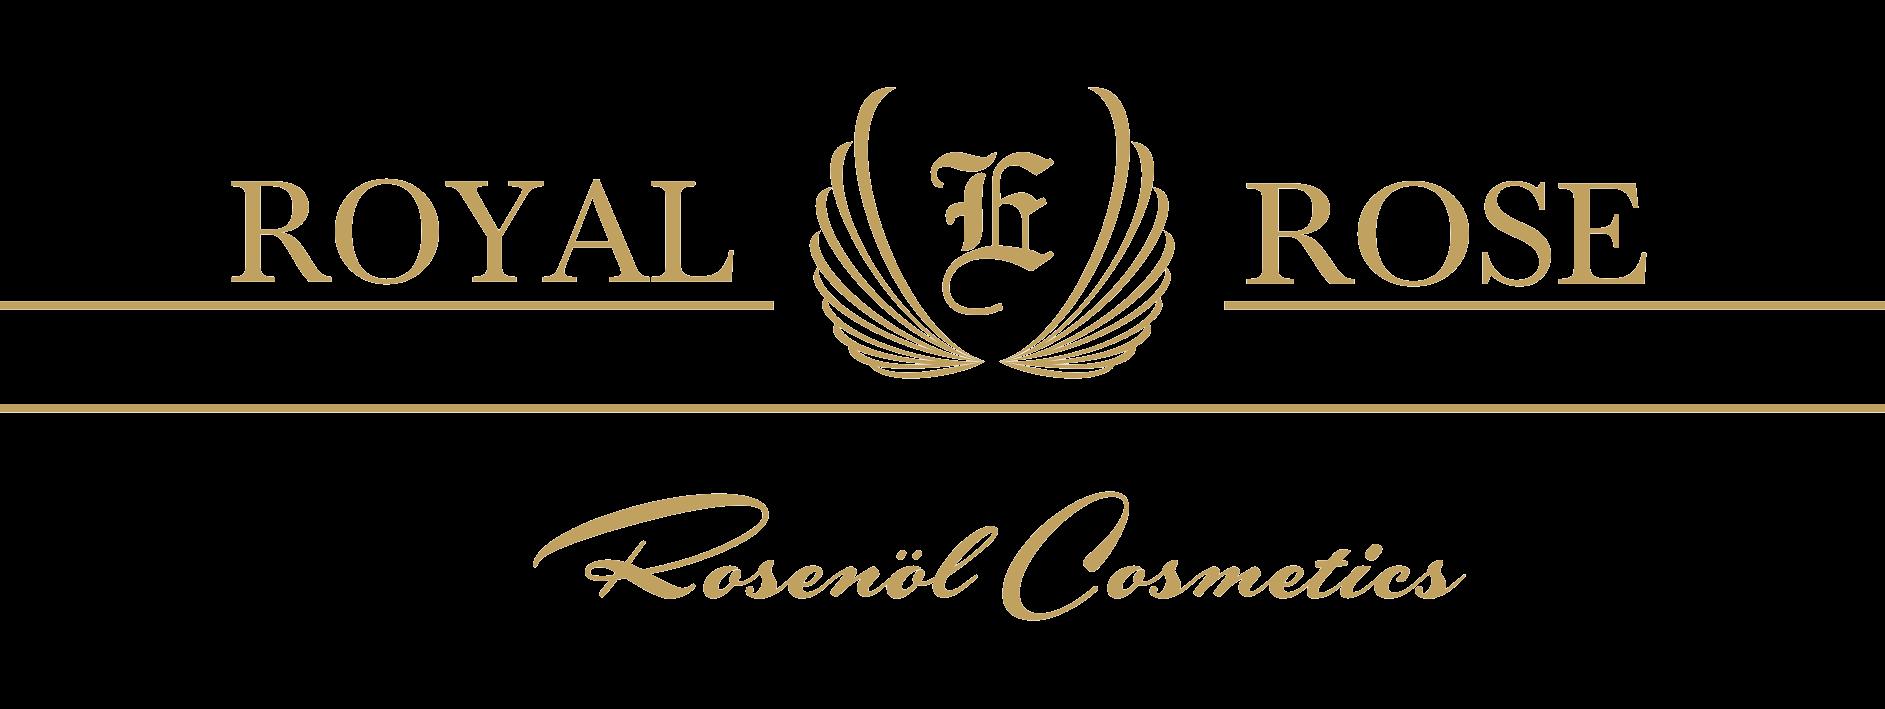 Royal Rose - Kosmetik mit bulgarischem Rosenöl